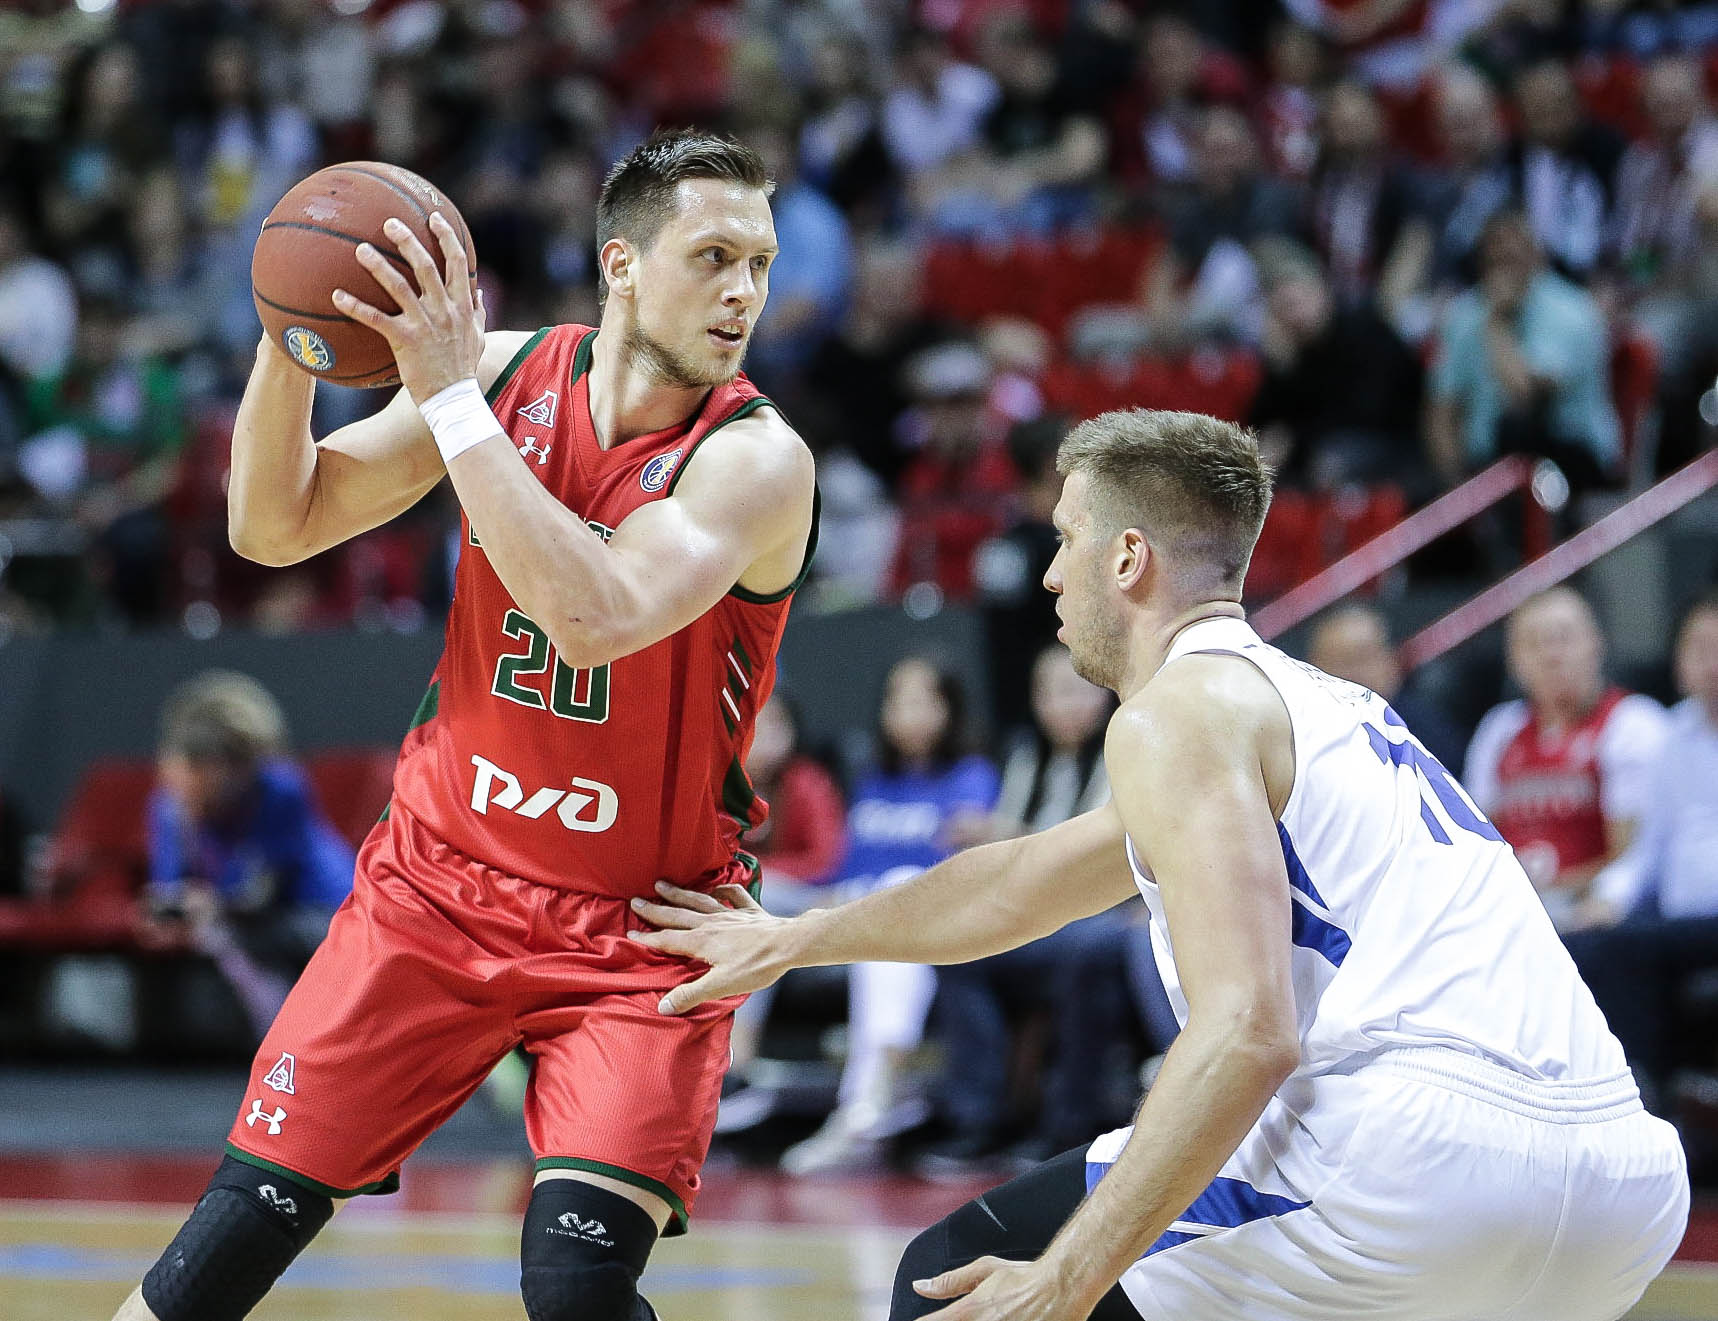 Lokomotiv Survives Zenit Rally To Even Series